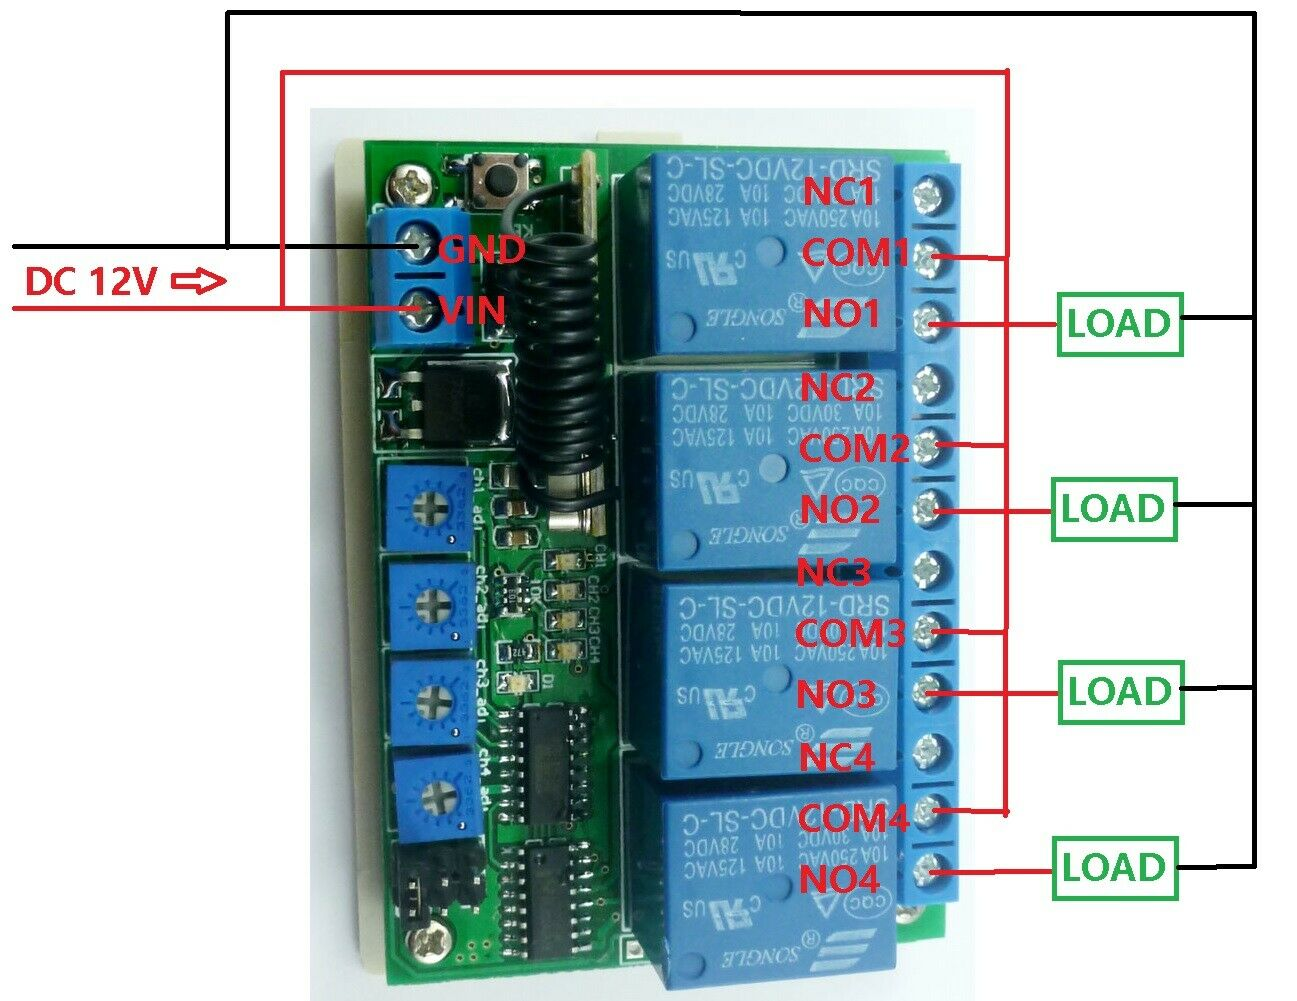 DC 12V 4CH 433M Delay Timer RF Wireless Relay Controller ...